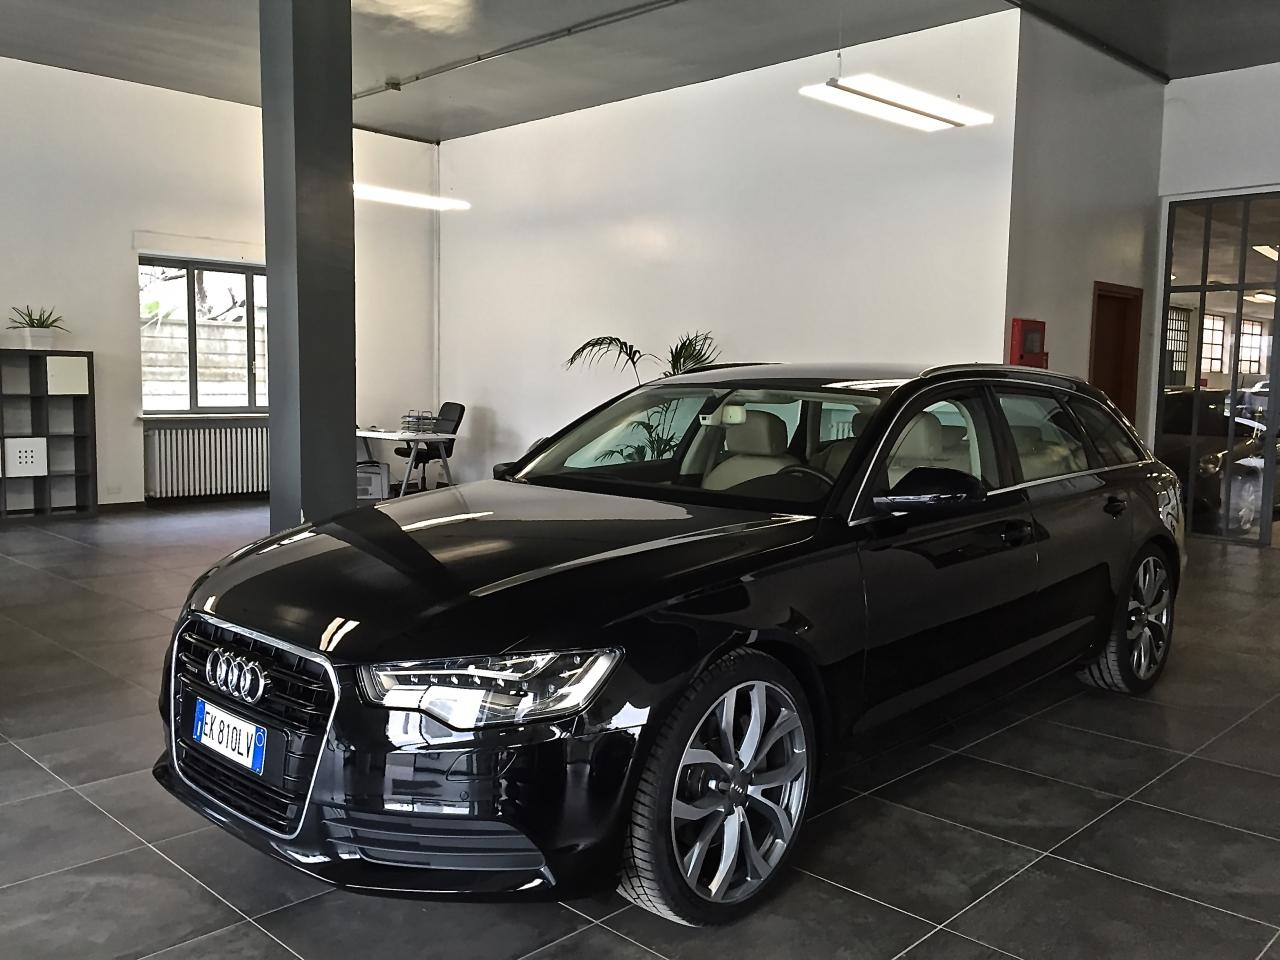 auto usate Audi Torino